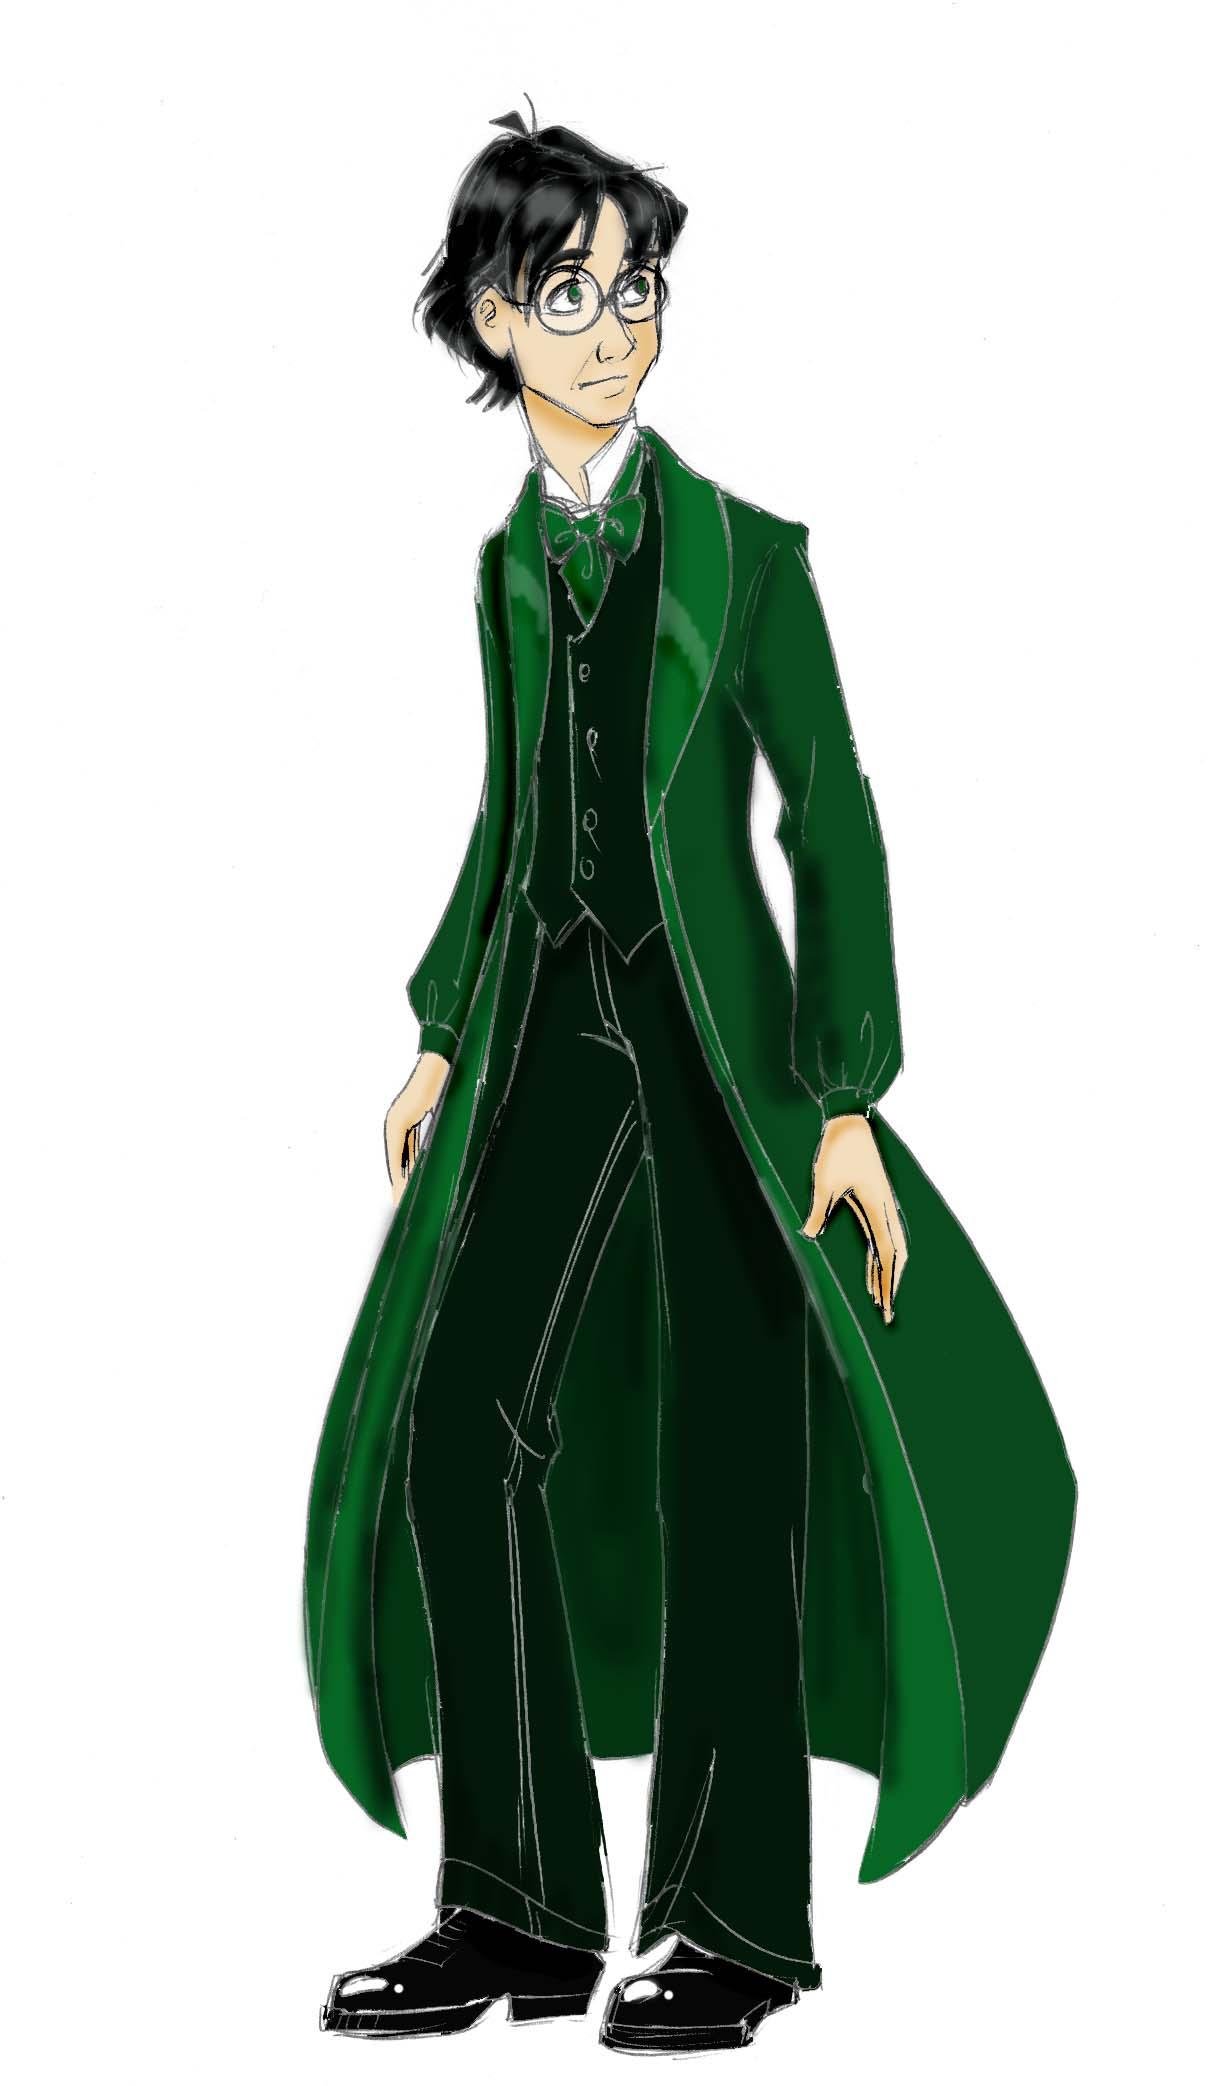 Mrs. Weasley picks emerald-green dress robes to enhance his eye color